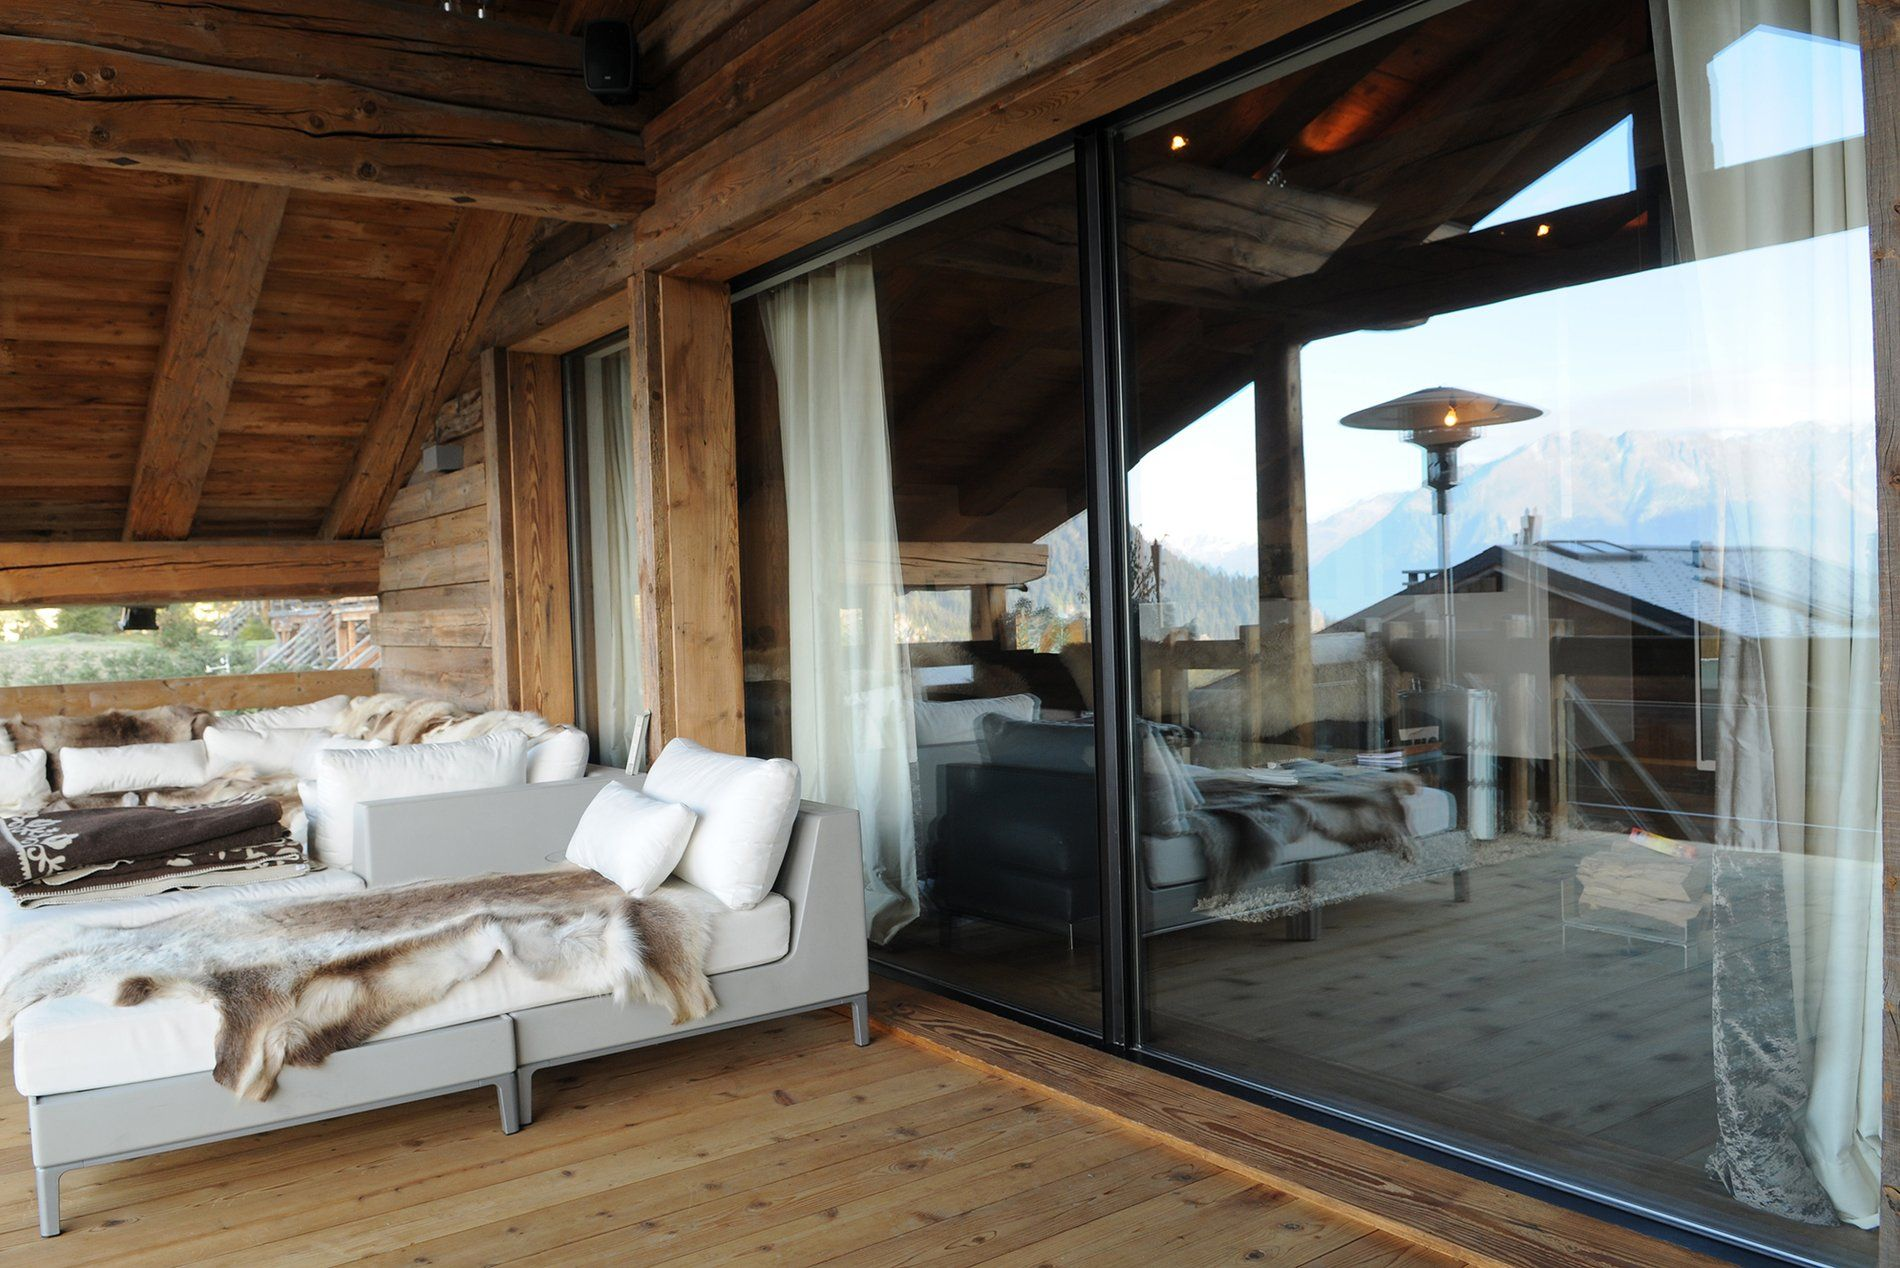 Sky Frame Fenster terrasse sky frame 3 chalet aiguille blanche ch fenster